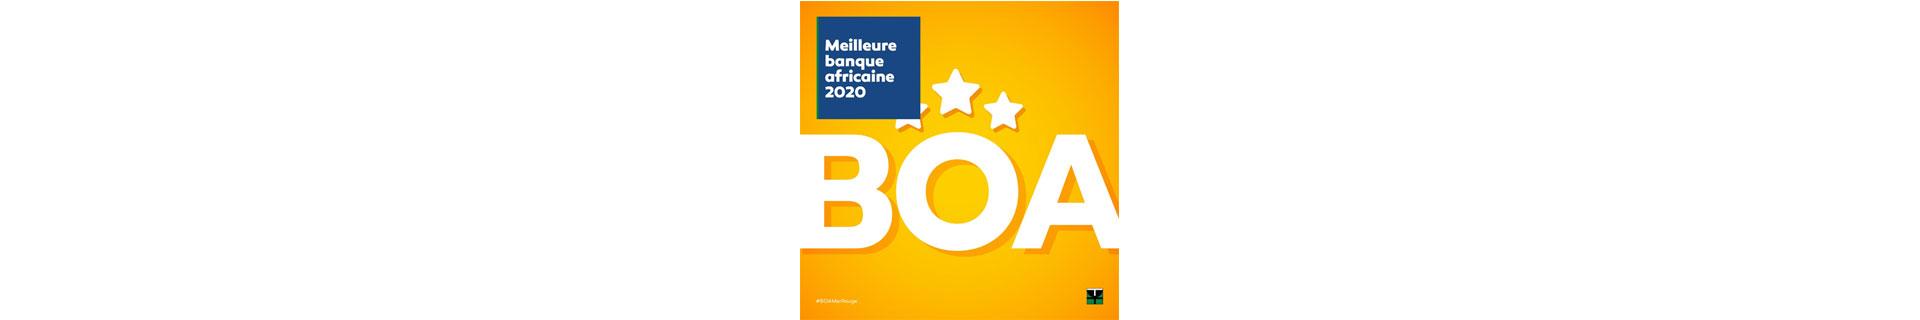 BANK OF AFRICA désignée «meilleure banque africaine 2020»